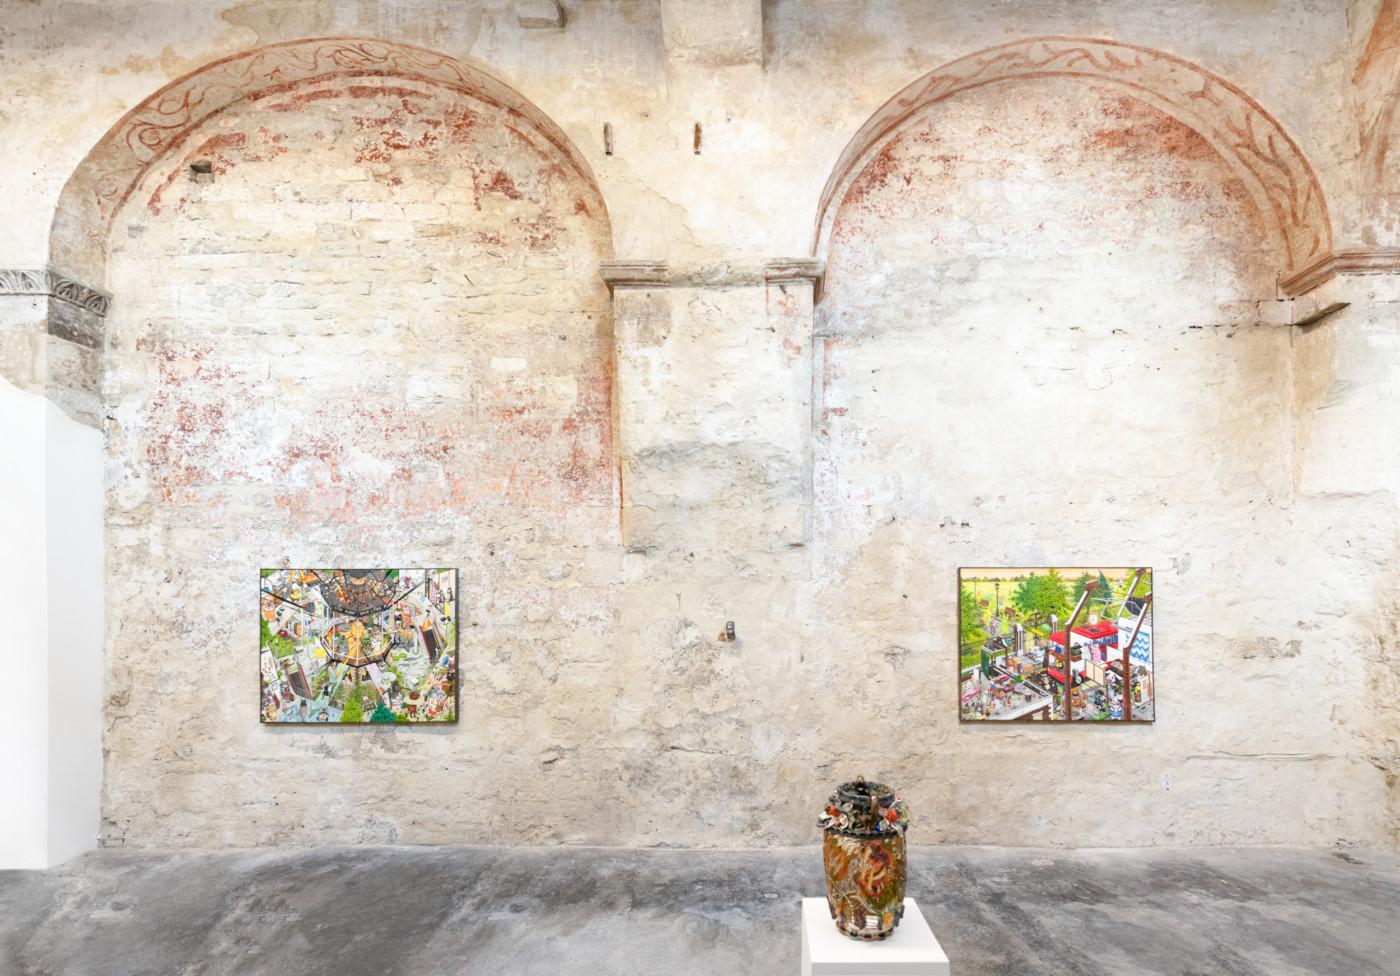 HUN KYU KIM  EGRESS,  2021, High Art, Arles, France, installation view - High Art Gallery Paris